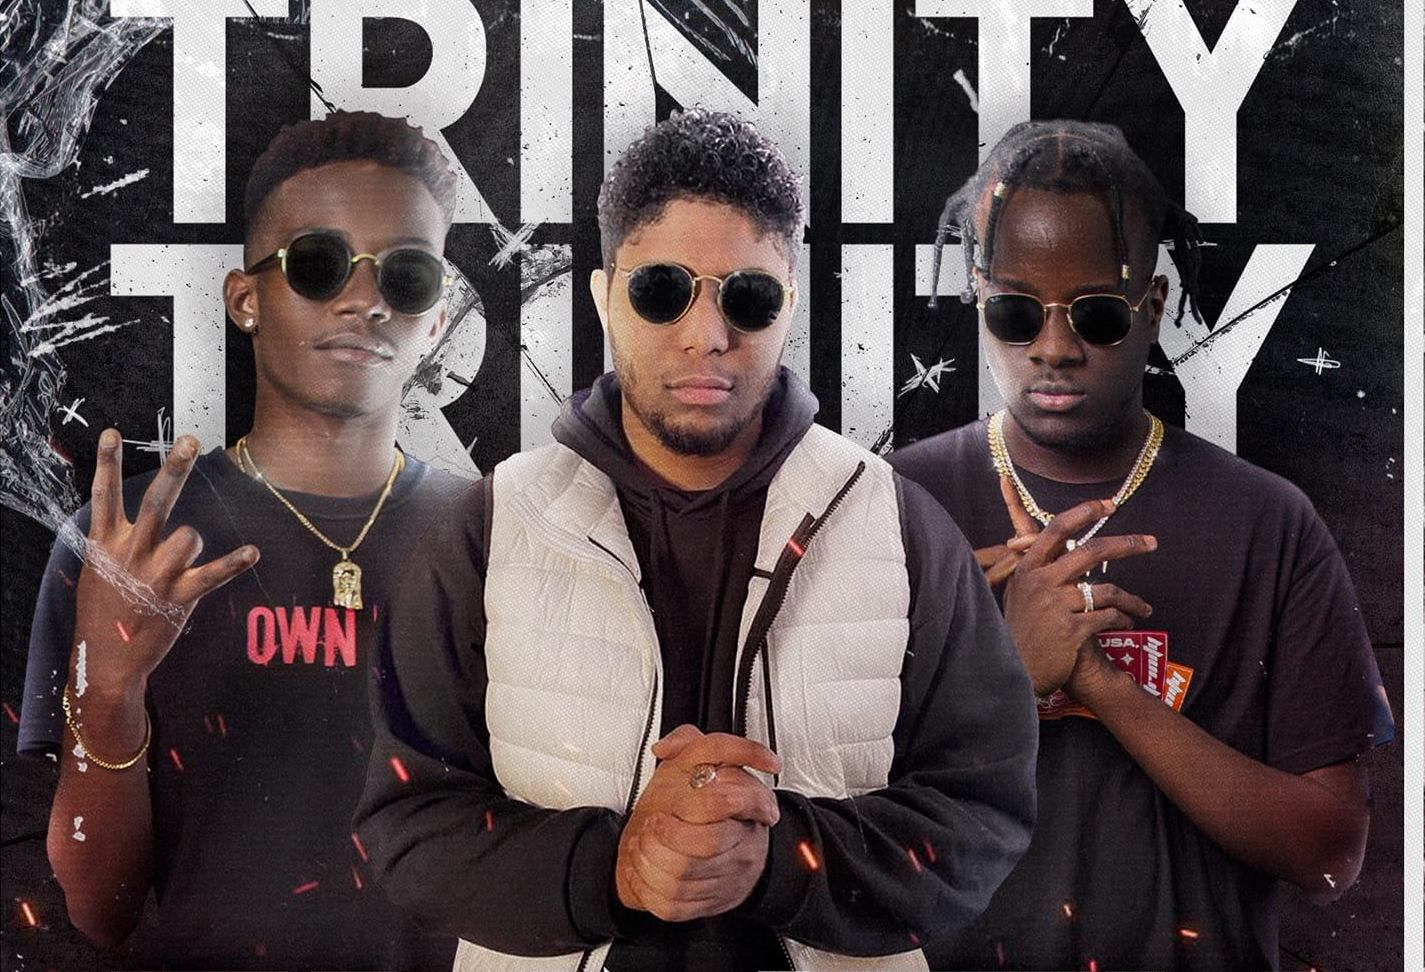 Trinity 3nity